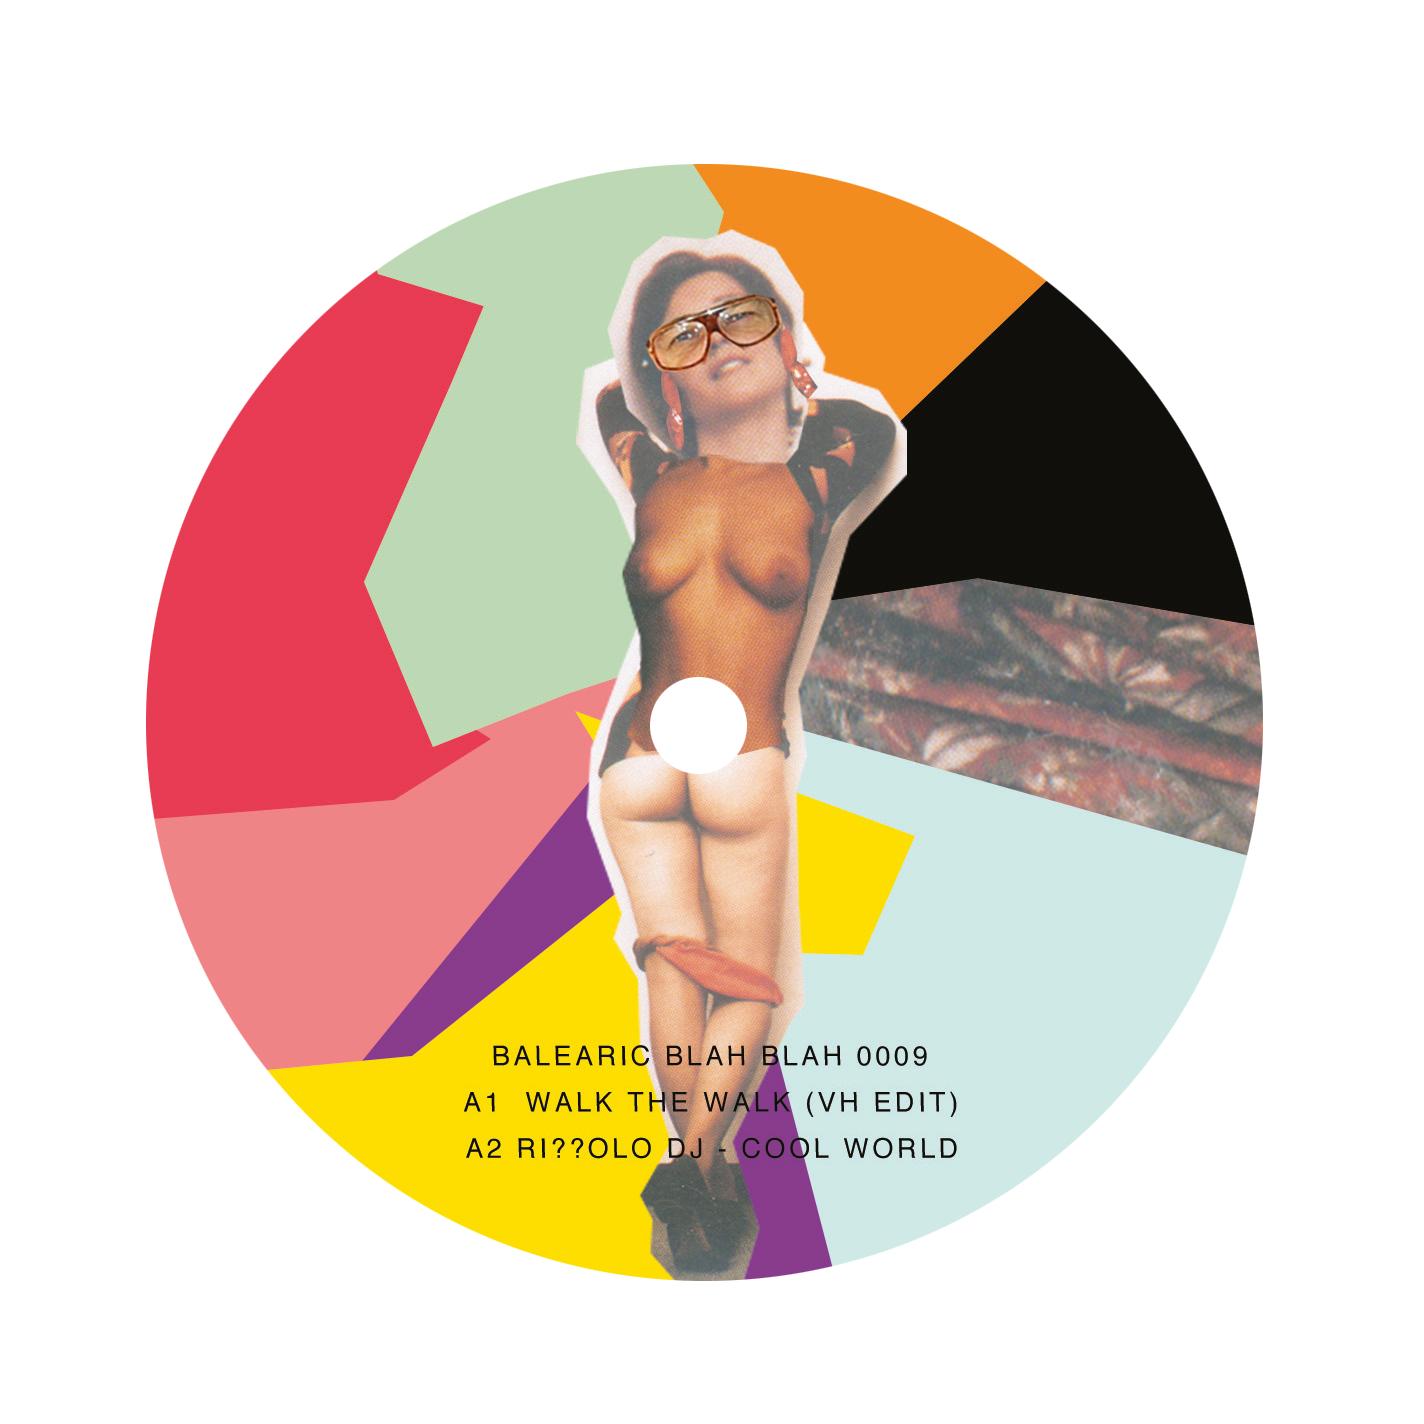 "KBE/BALEARIC BLAH BLAH EP #9 12"""